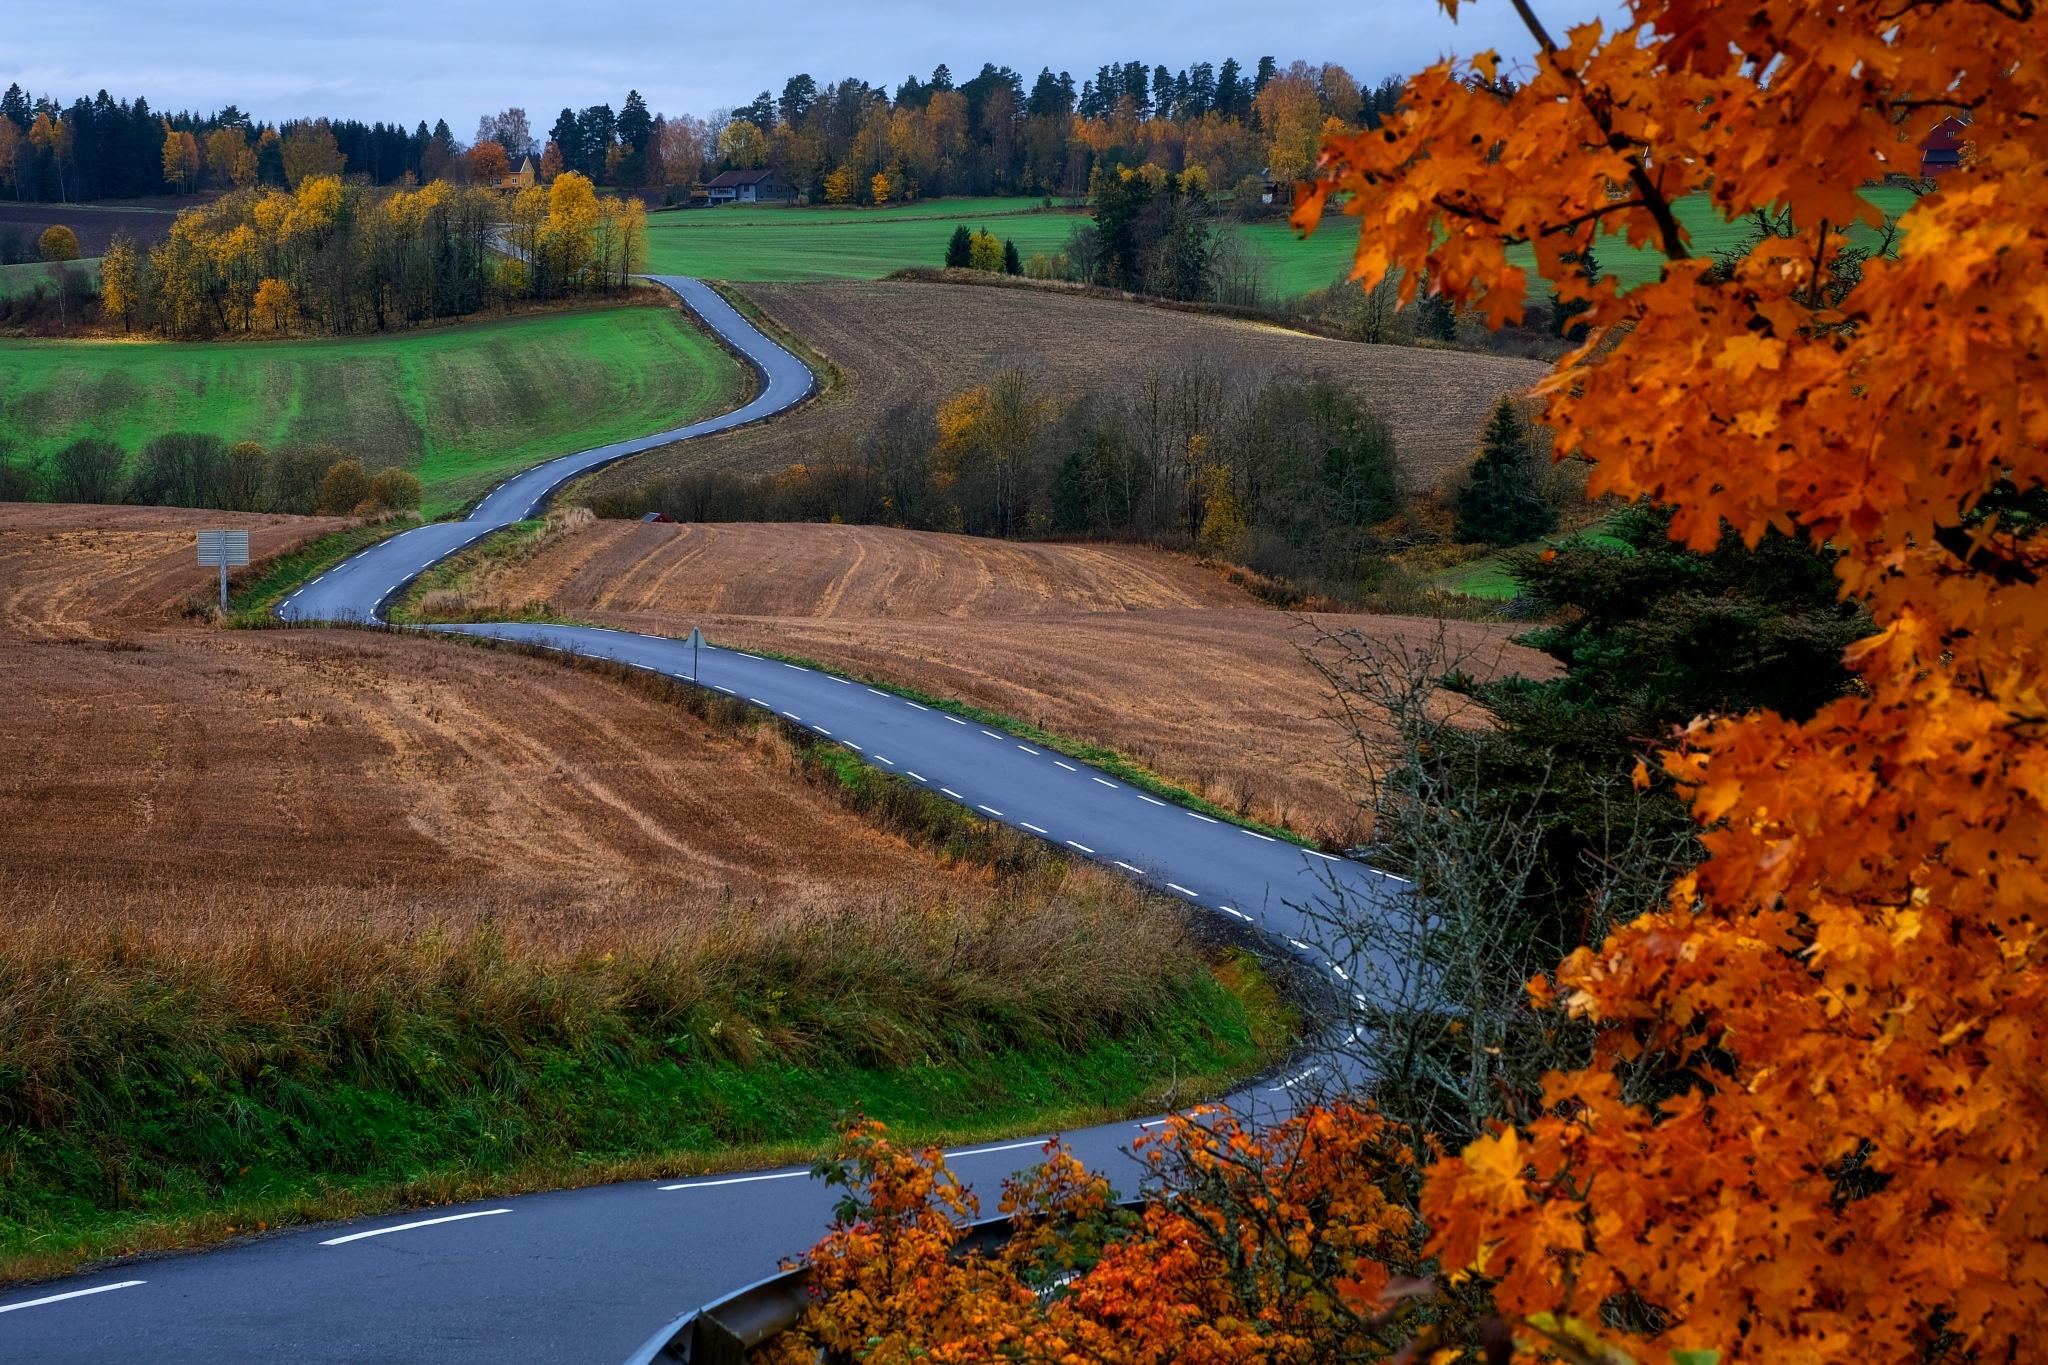 Autumn Road - Kingdom of Norway by Goran Jorganovich